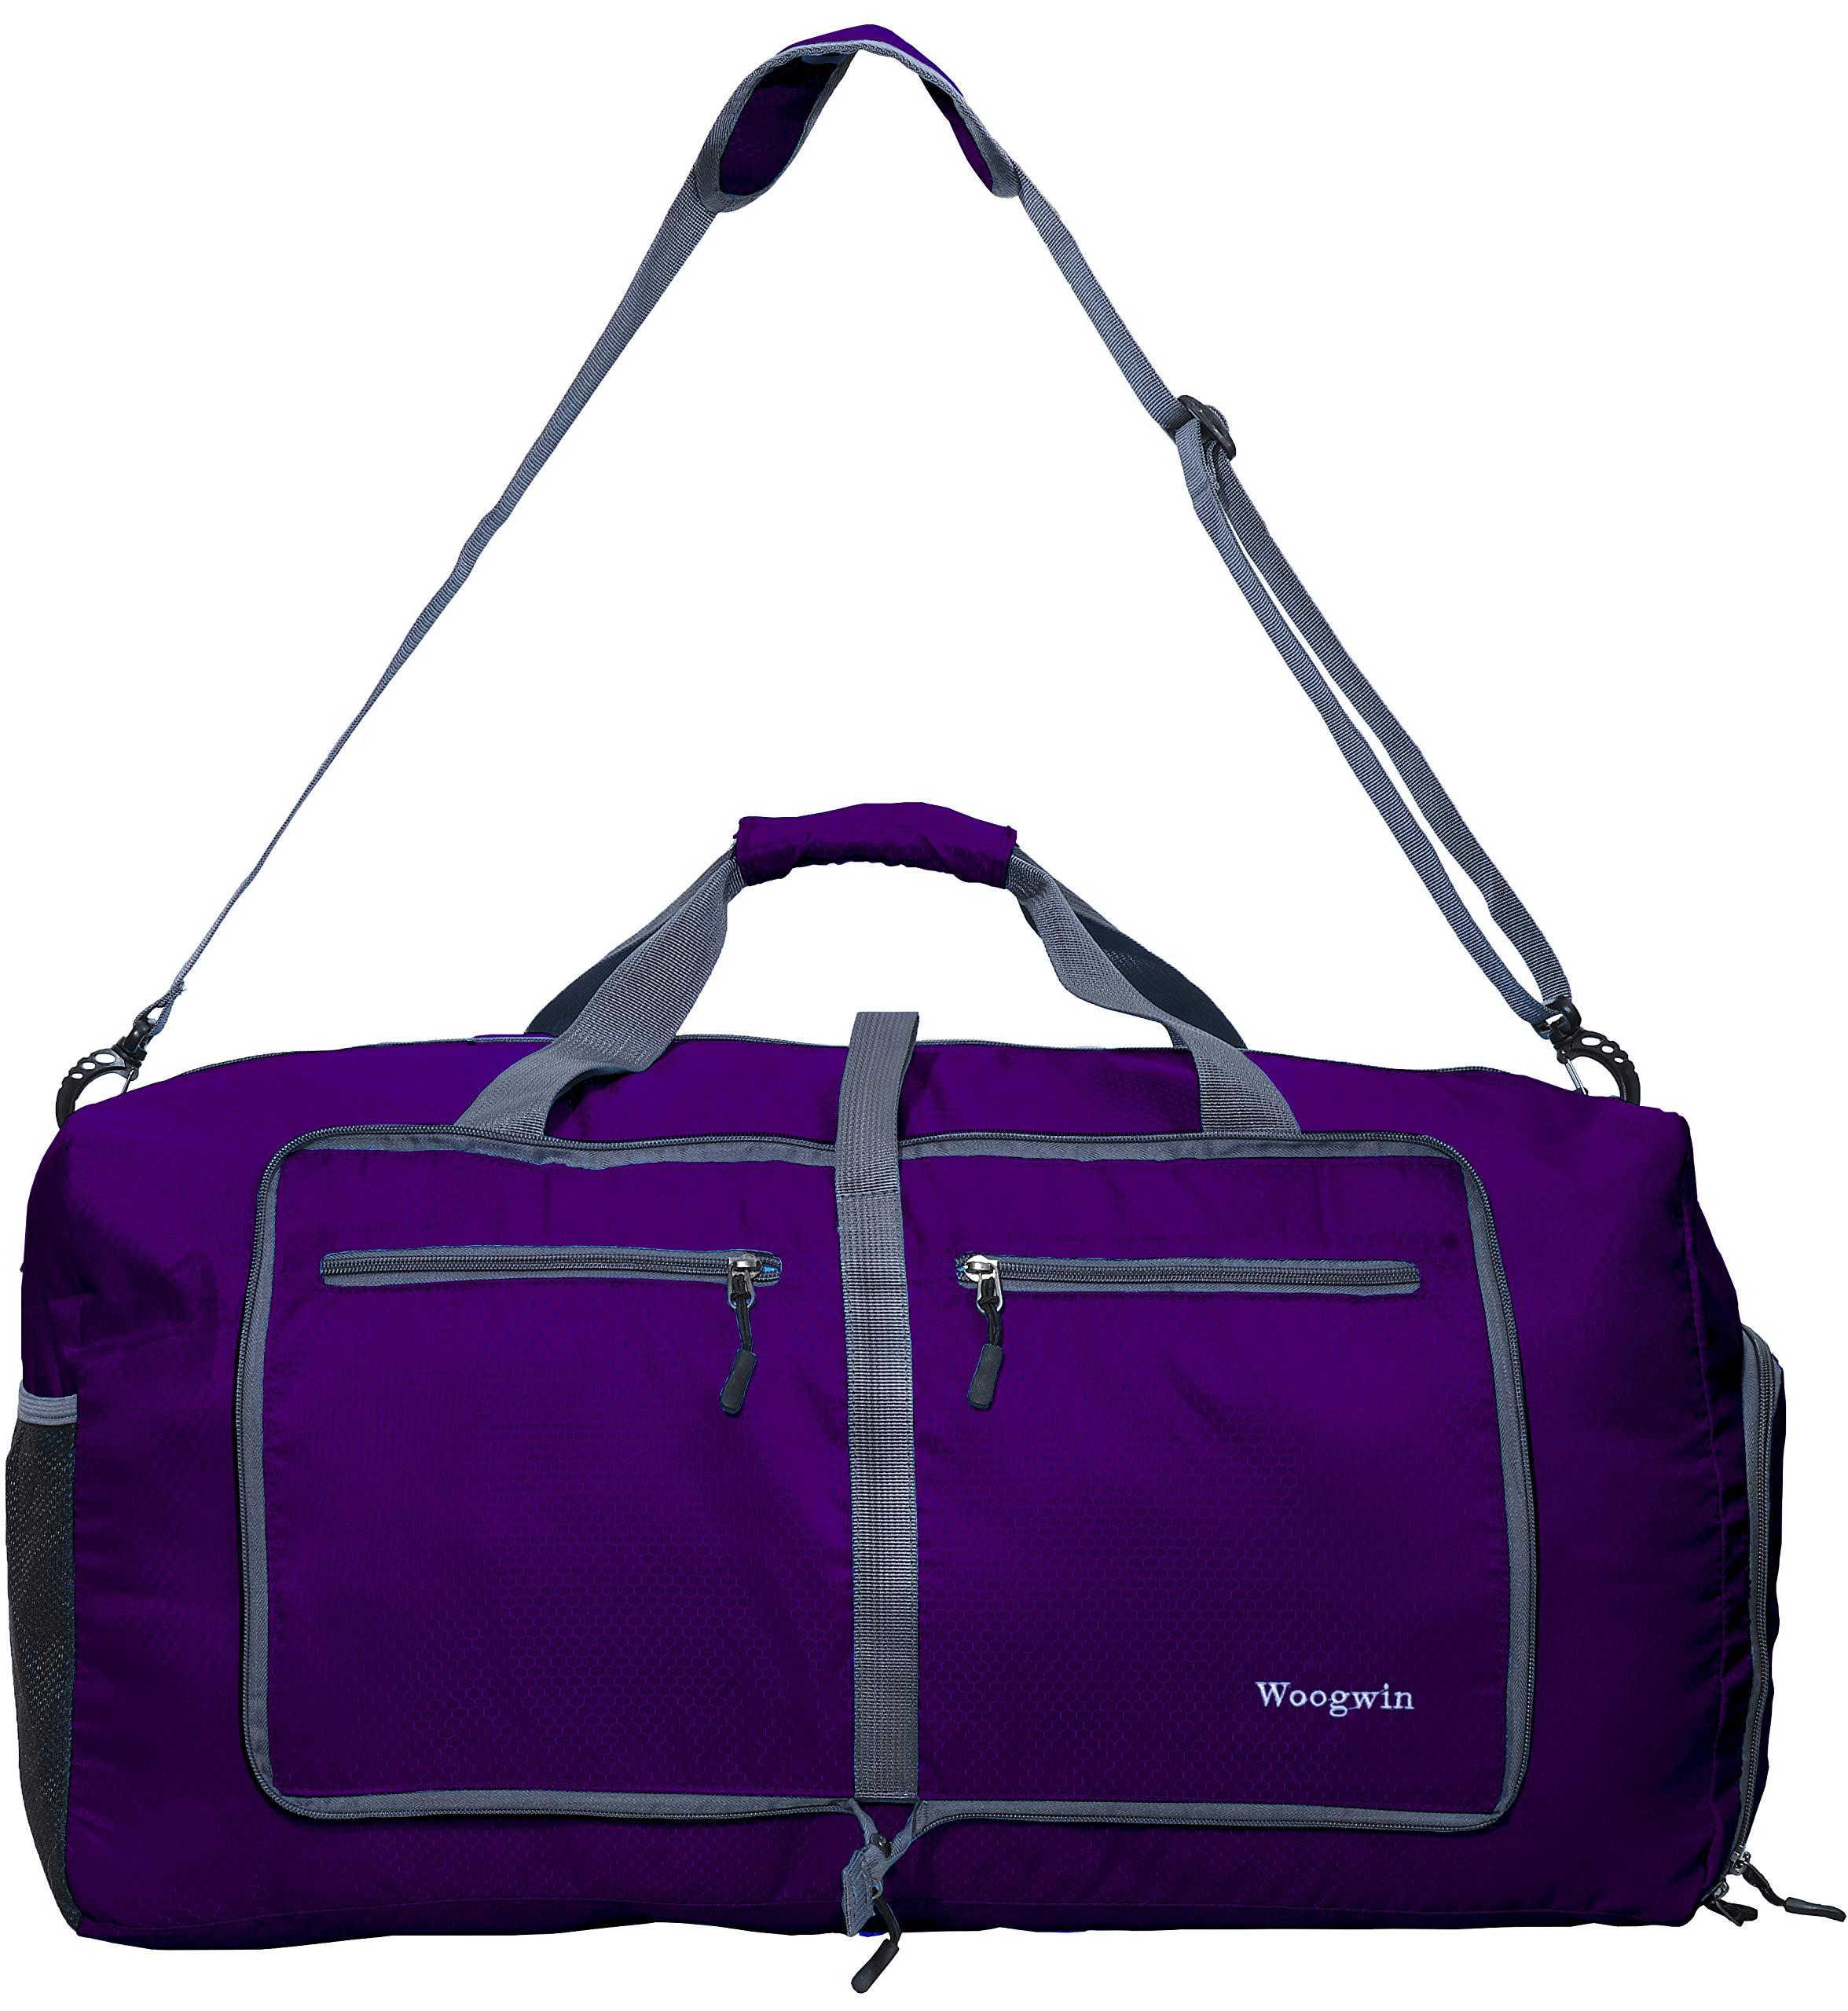 Woogwin Travel Duffel Bag Womens & Mens Large Foldable Duffle Sports Gym Bags (purple)